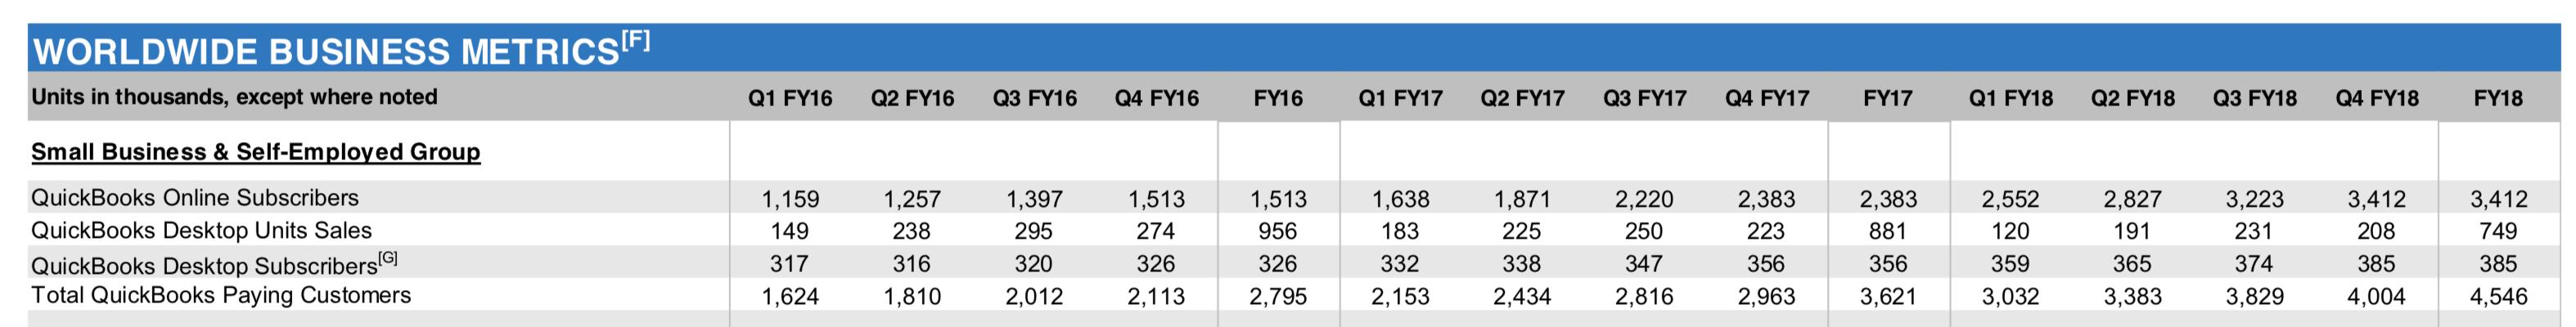 Intuit: Looking Ahead To FY19 Risks - Intuit Inc  (NASDAQ:INTU